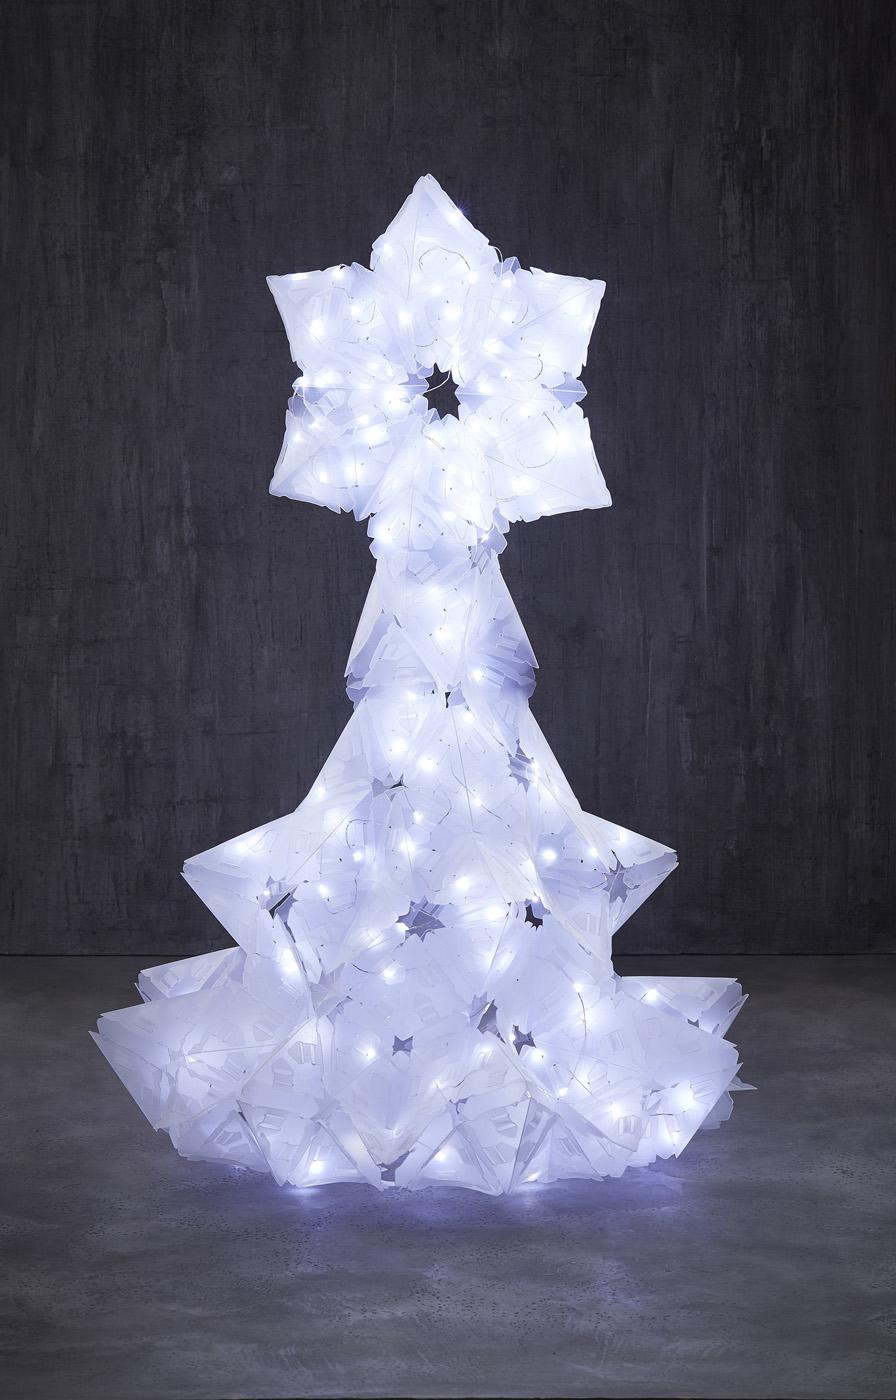 CREATTO_LIGHTS_CHRISTMAS_TREE_BIG.jpg